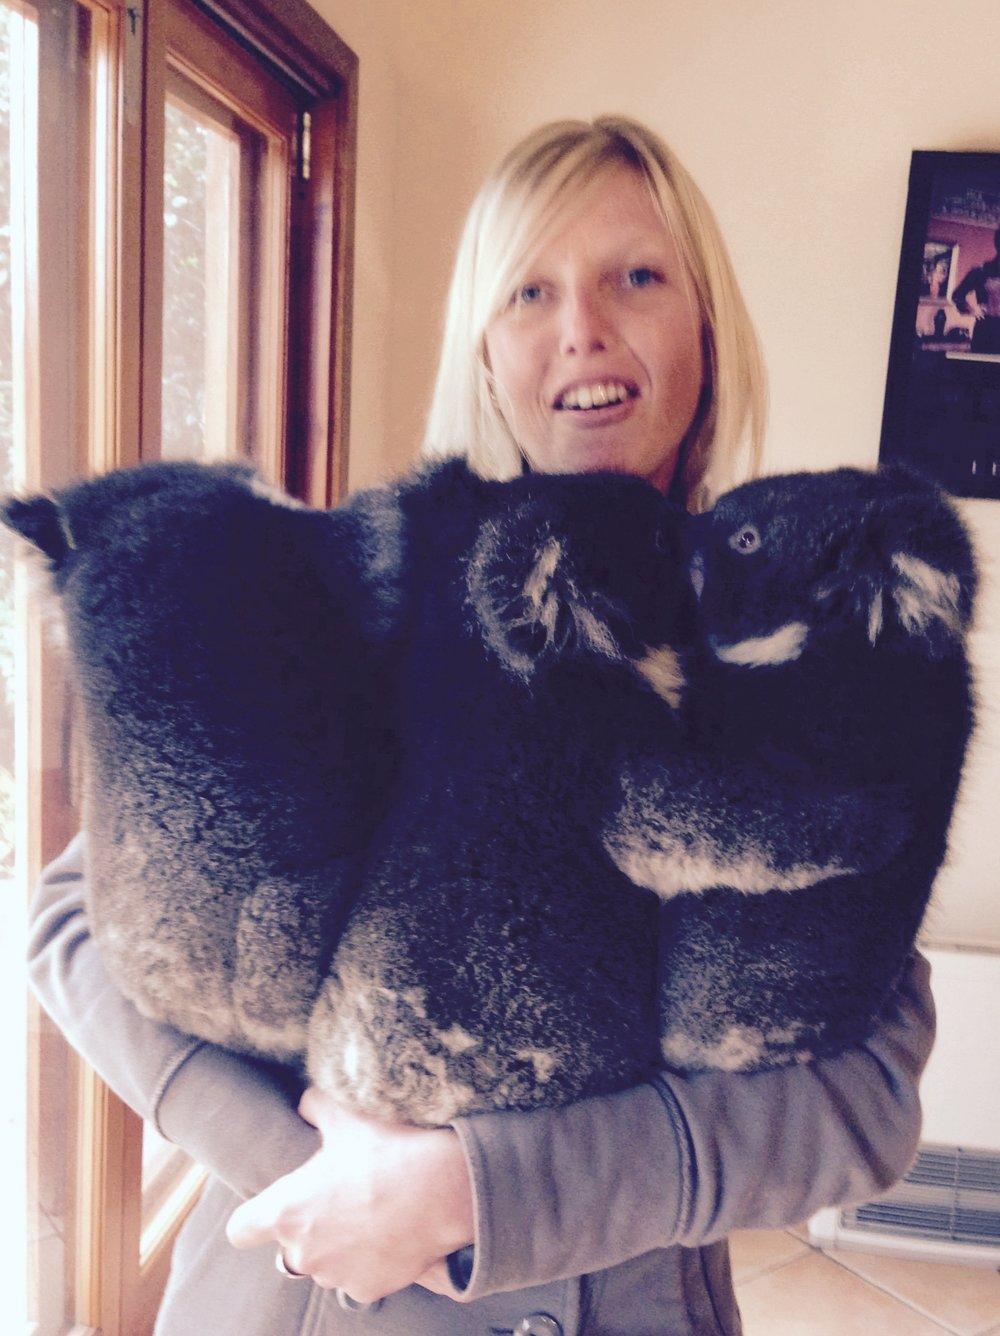 Three koala hugs are better than one.